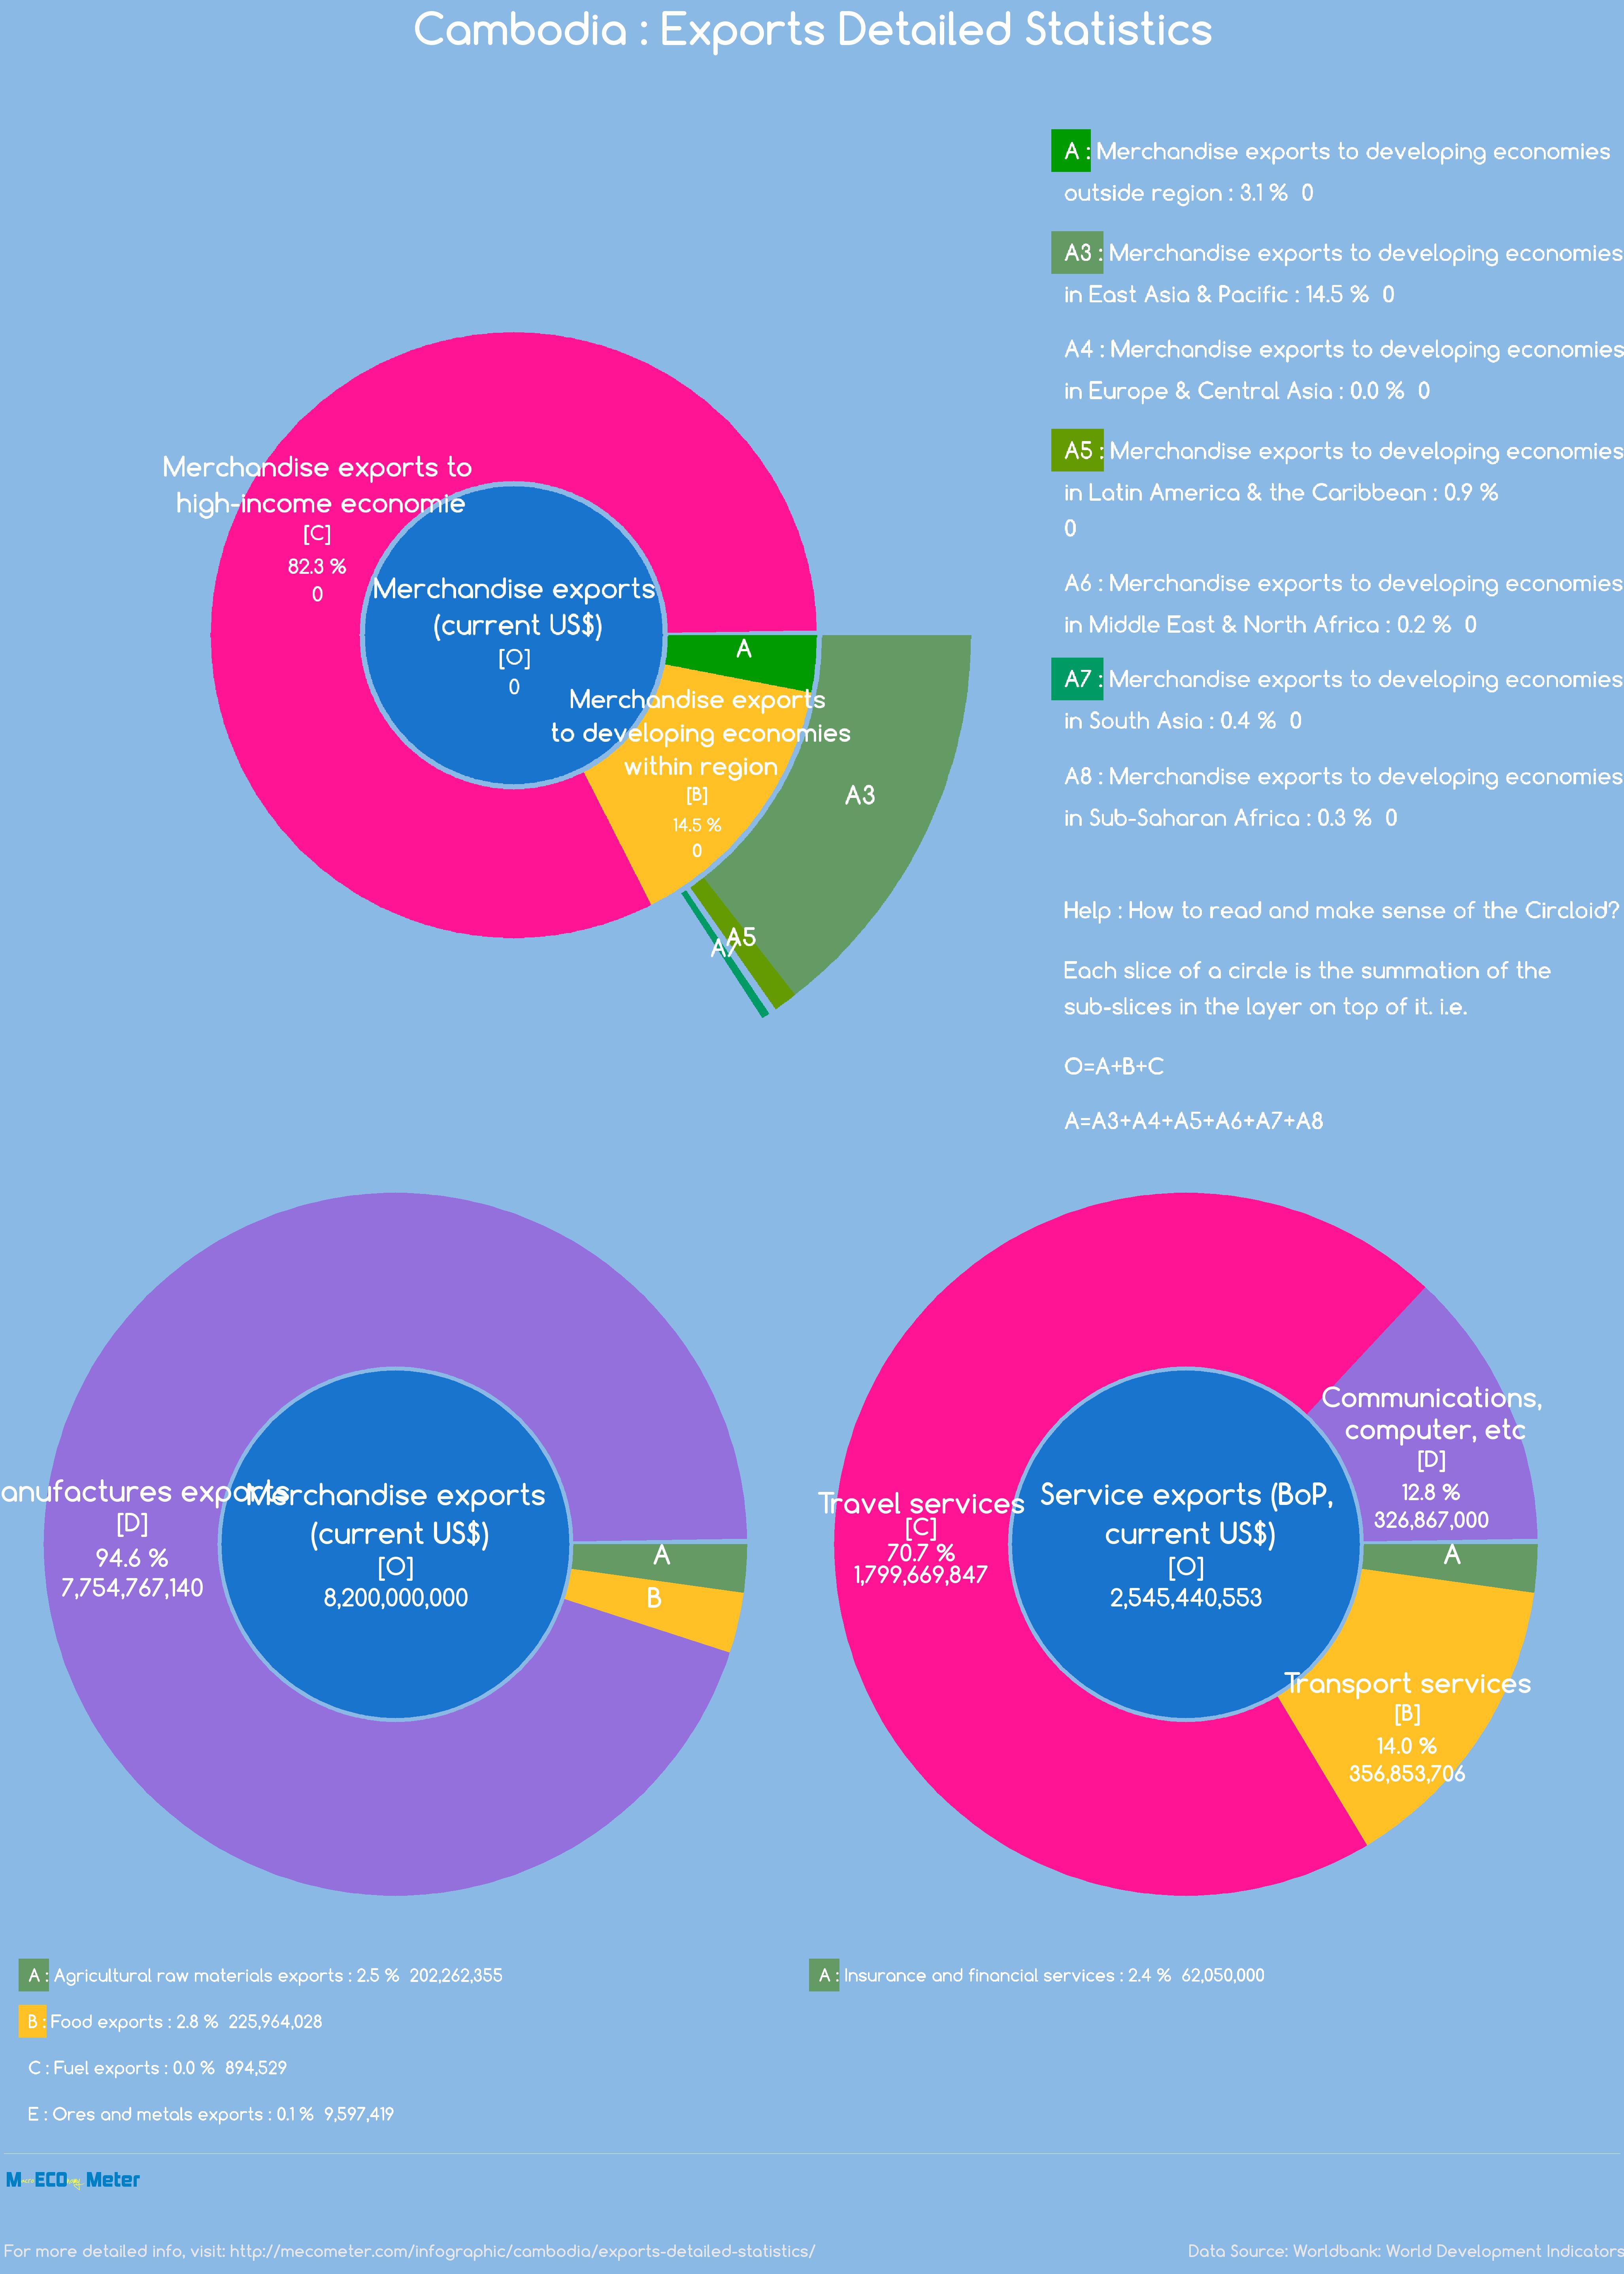 Cambodia : Exports Detailed Statistics